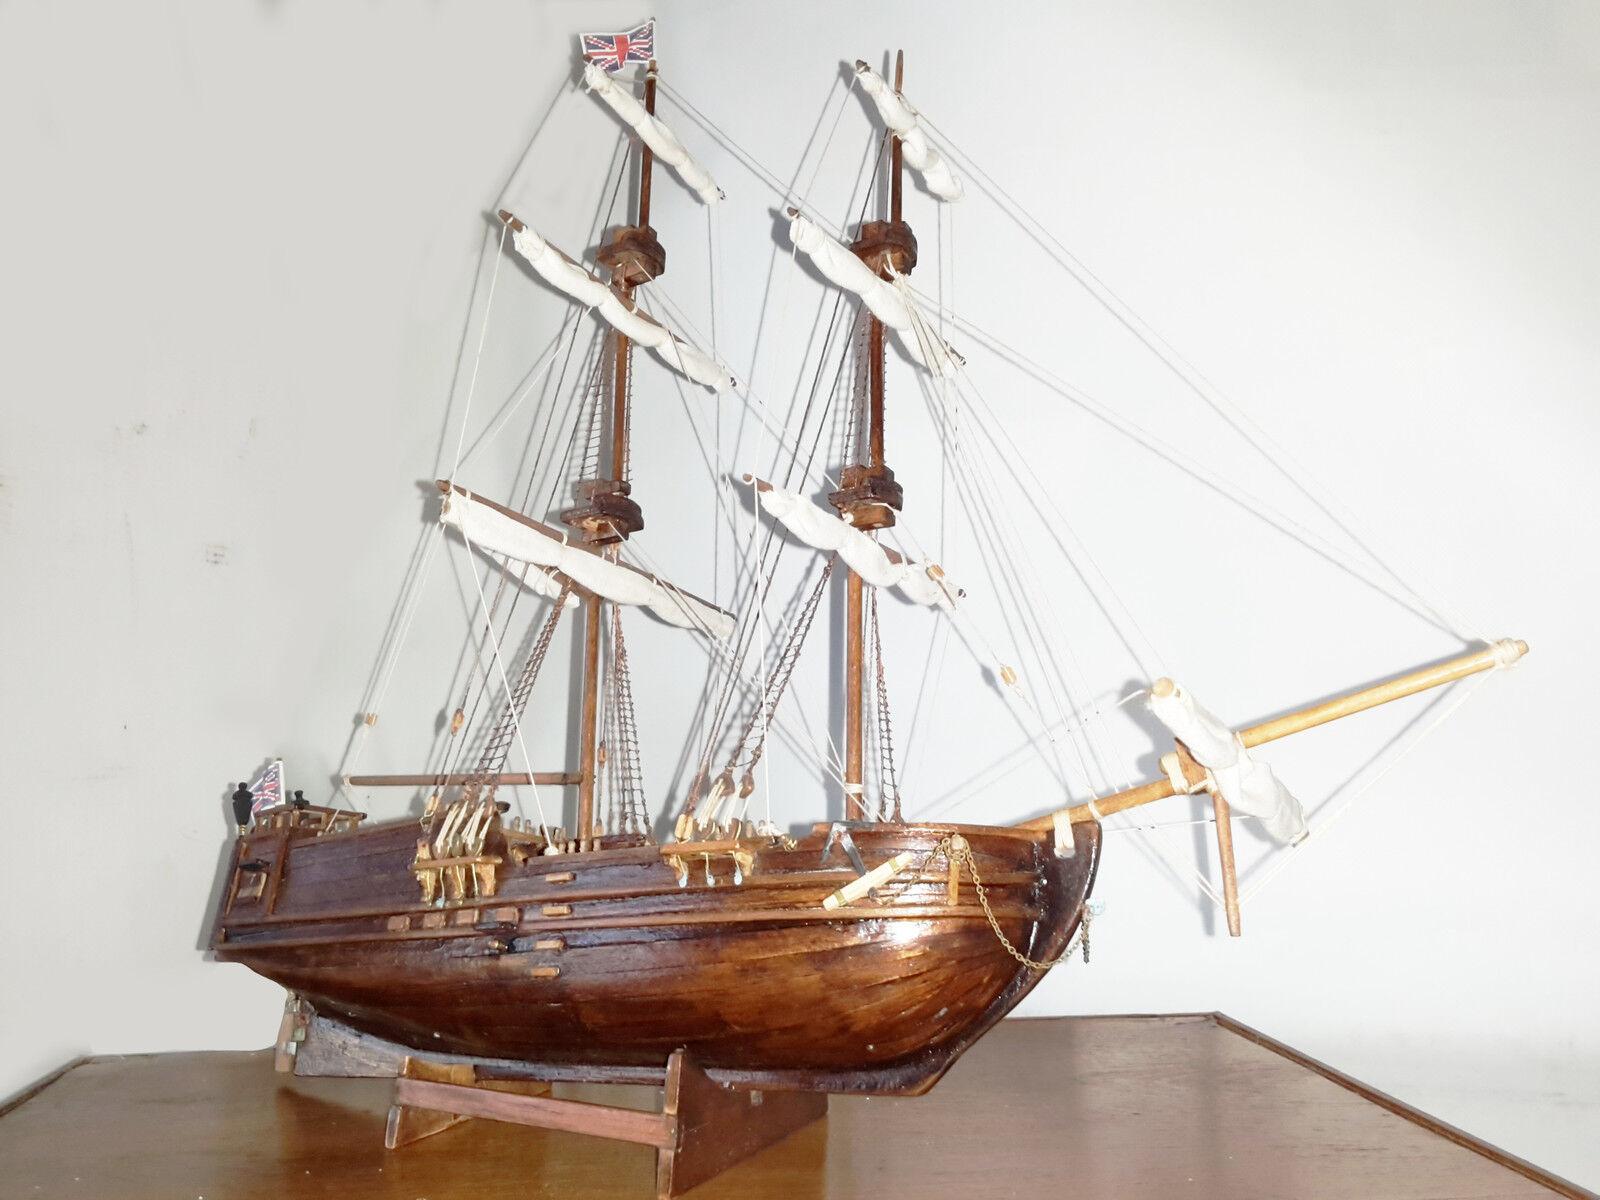 Goldener stern barco de madera con la mano bergant 45 í n tedesco 1770